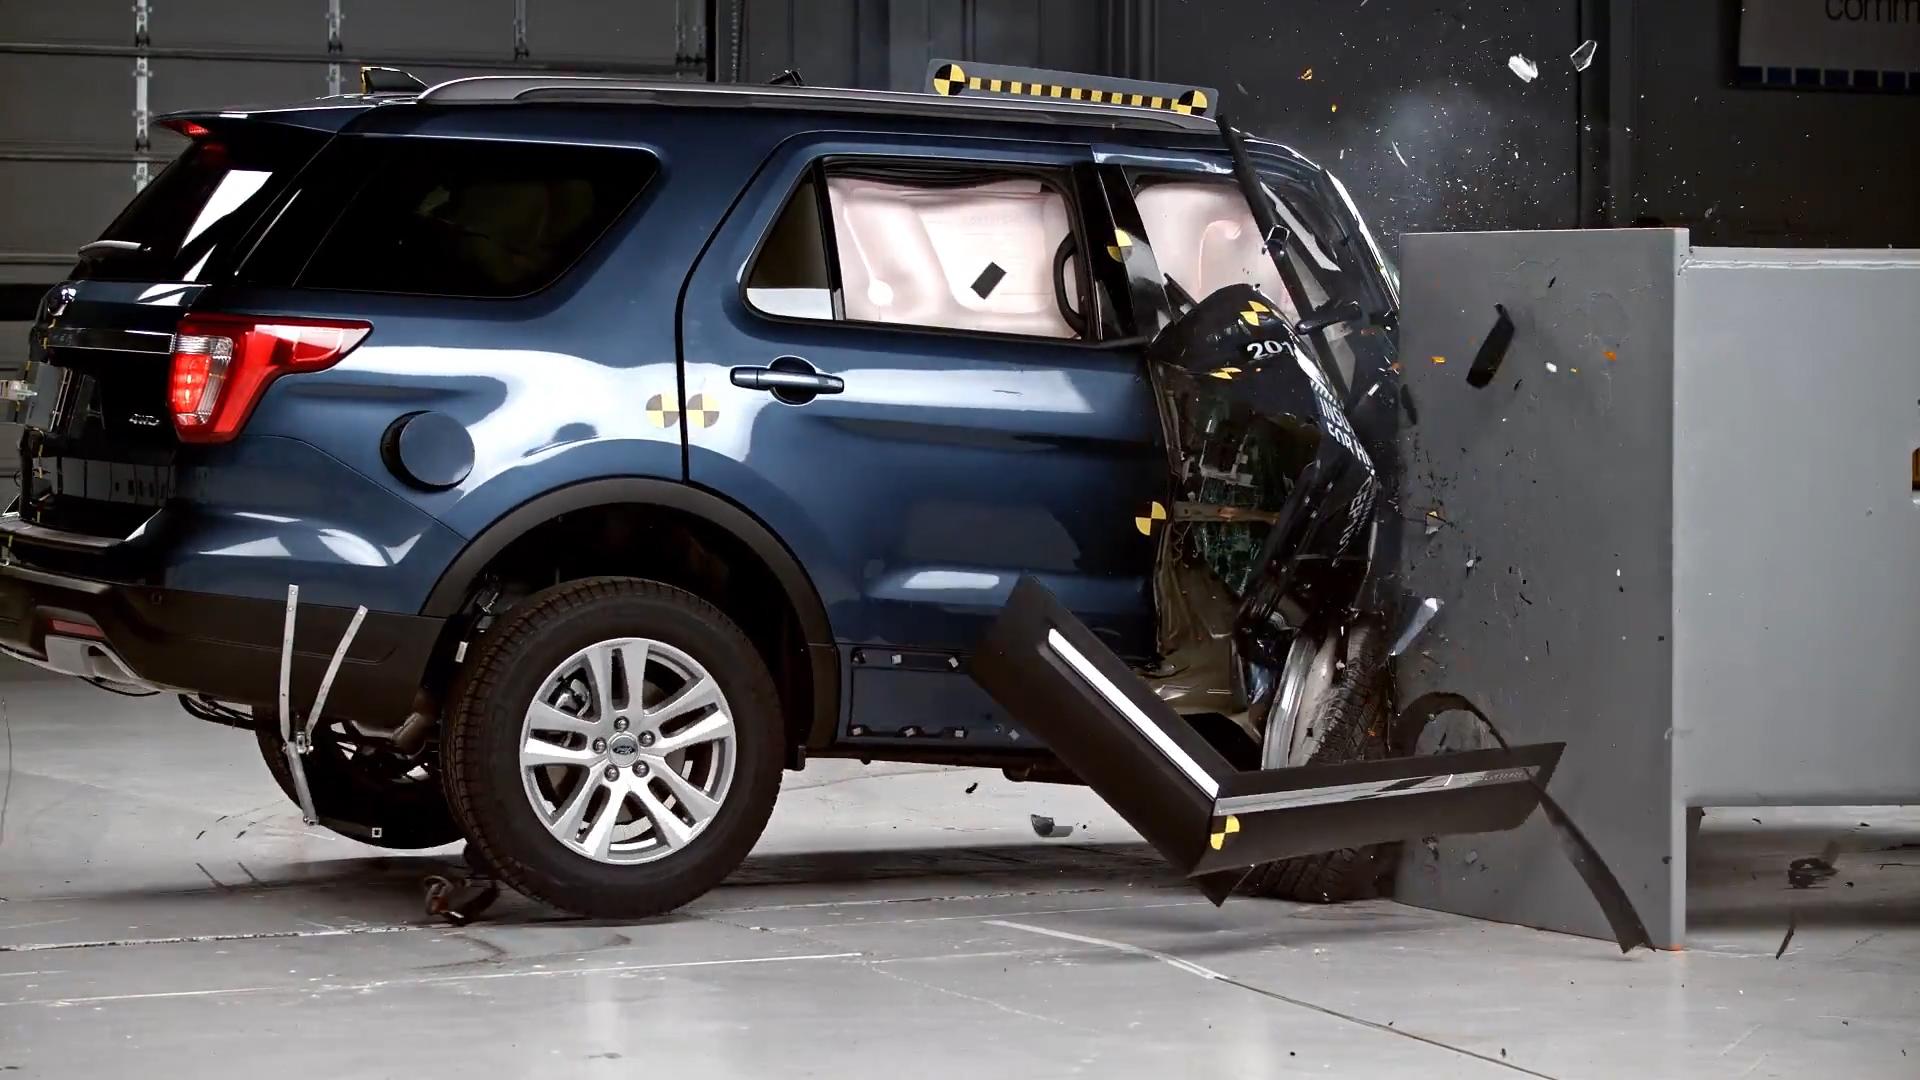 Jeep grand cherokee and ford explorer flunk crash test cnn video